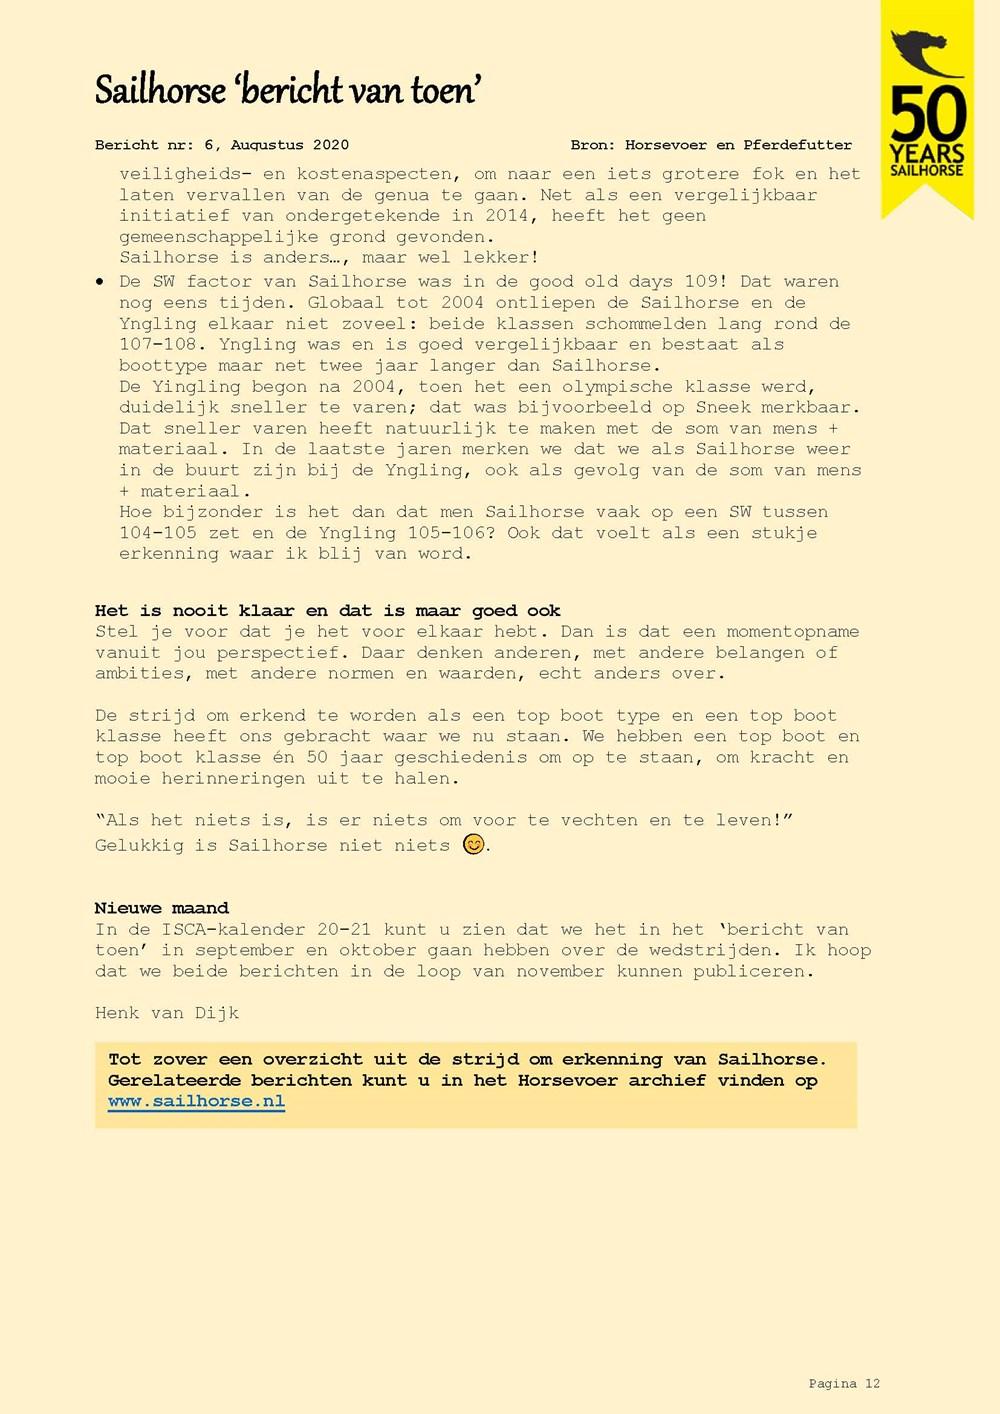 BvT06_3_Page_12.jpg